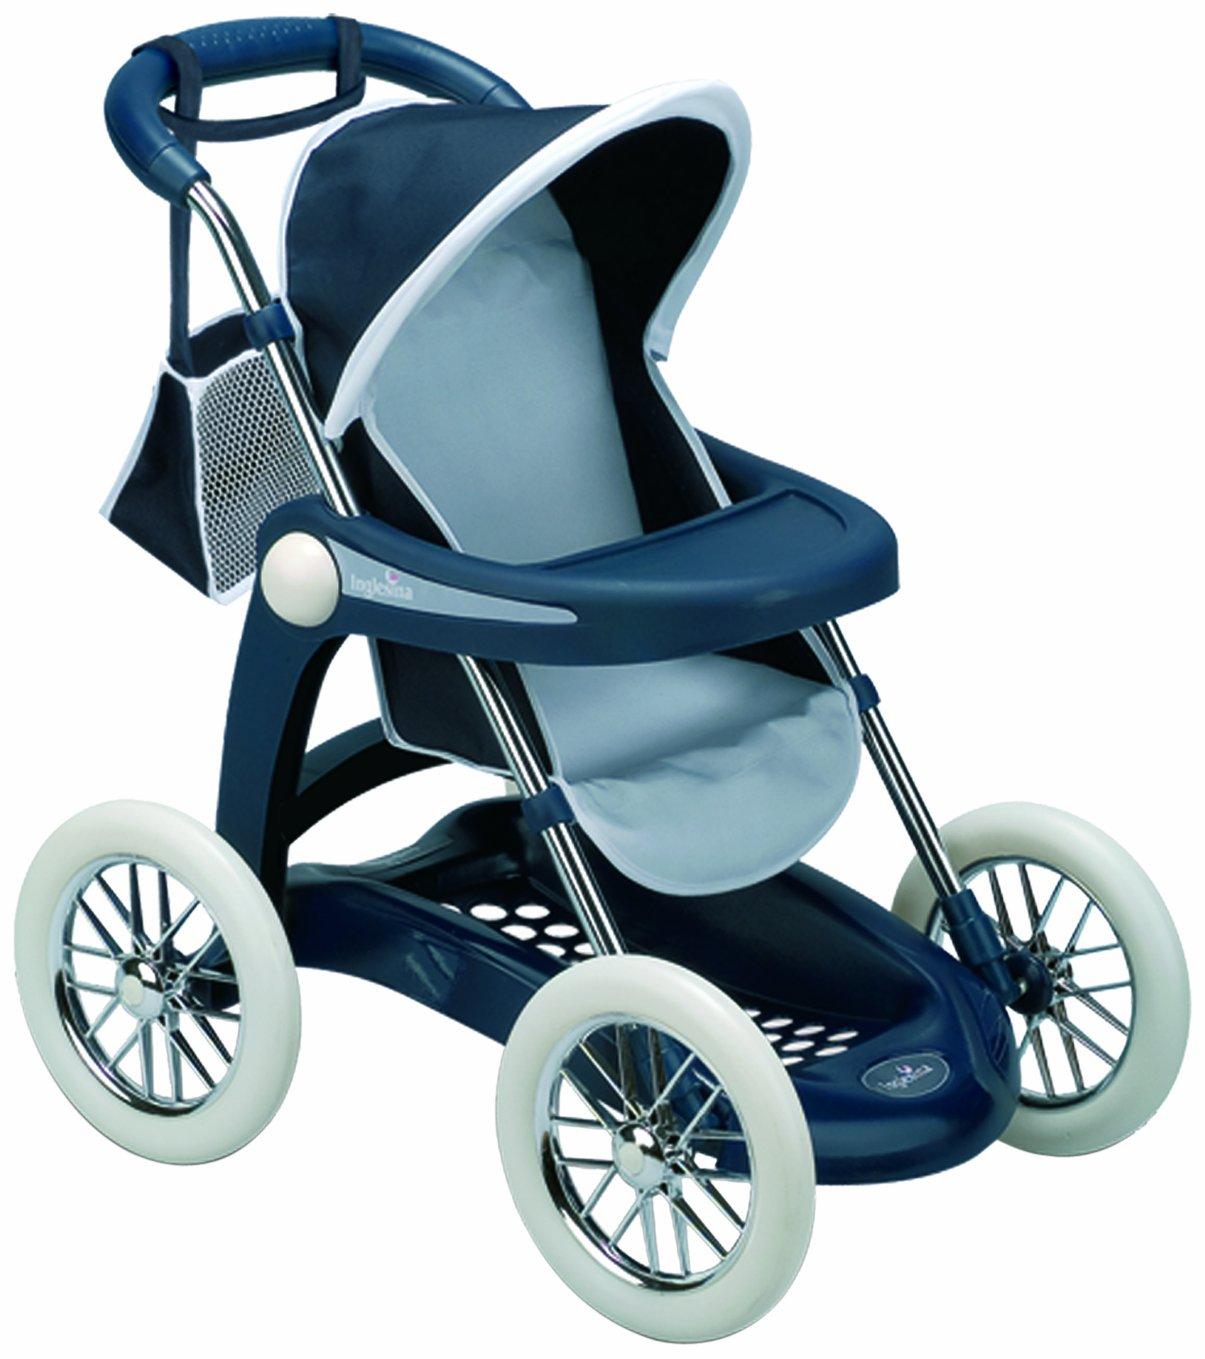 Inglesina - Sillita Plegable, Color Azul Marino (Smoby 516781)